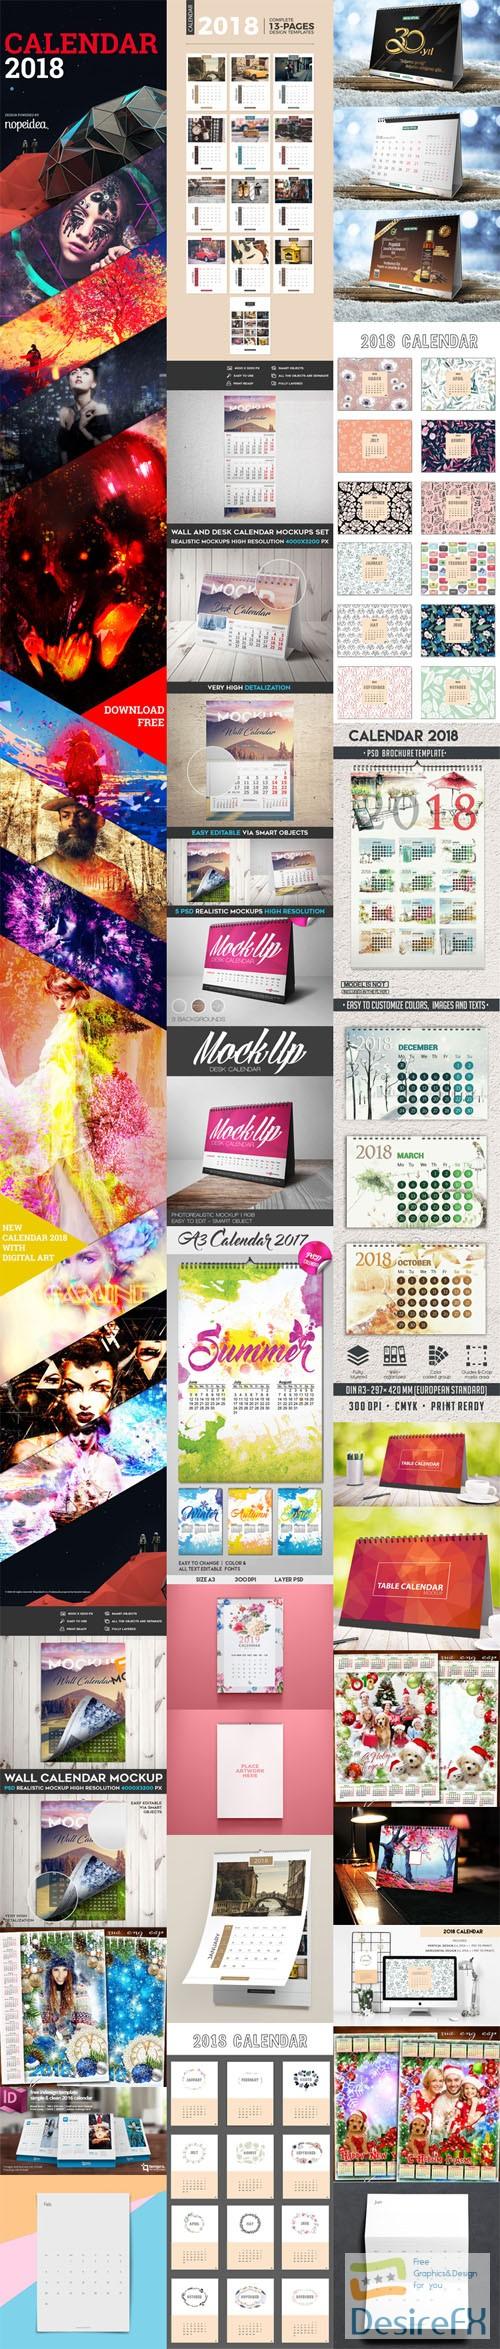 mock-up - Calendar Templates & Mockups Collection [PSD/Ai/Indd/PDF]